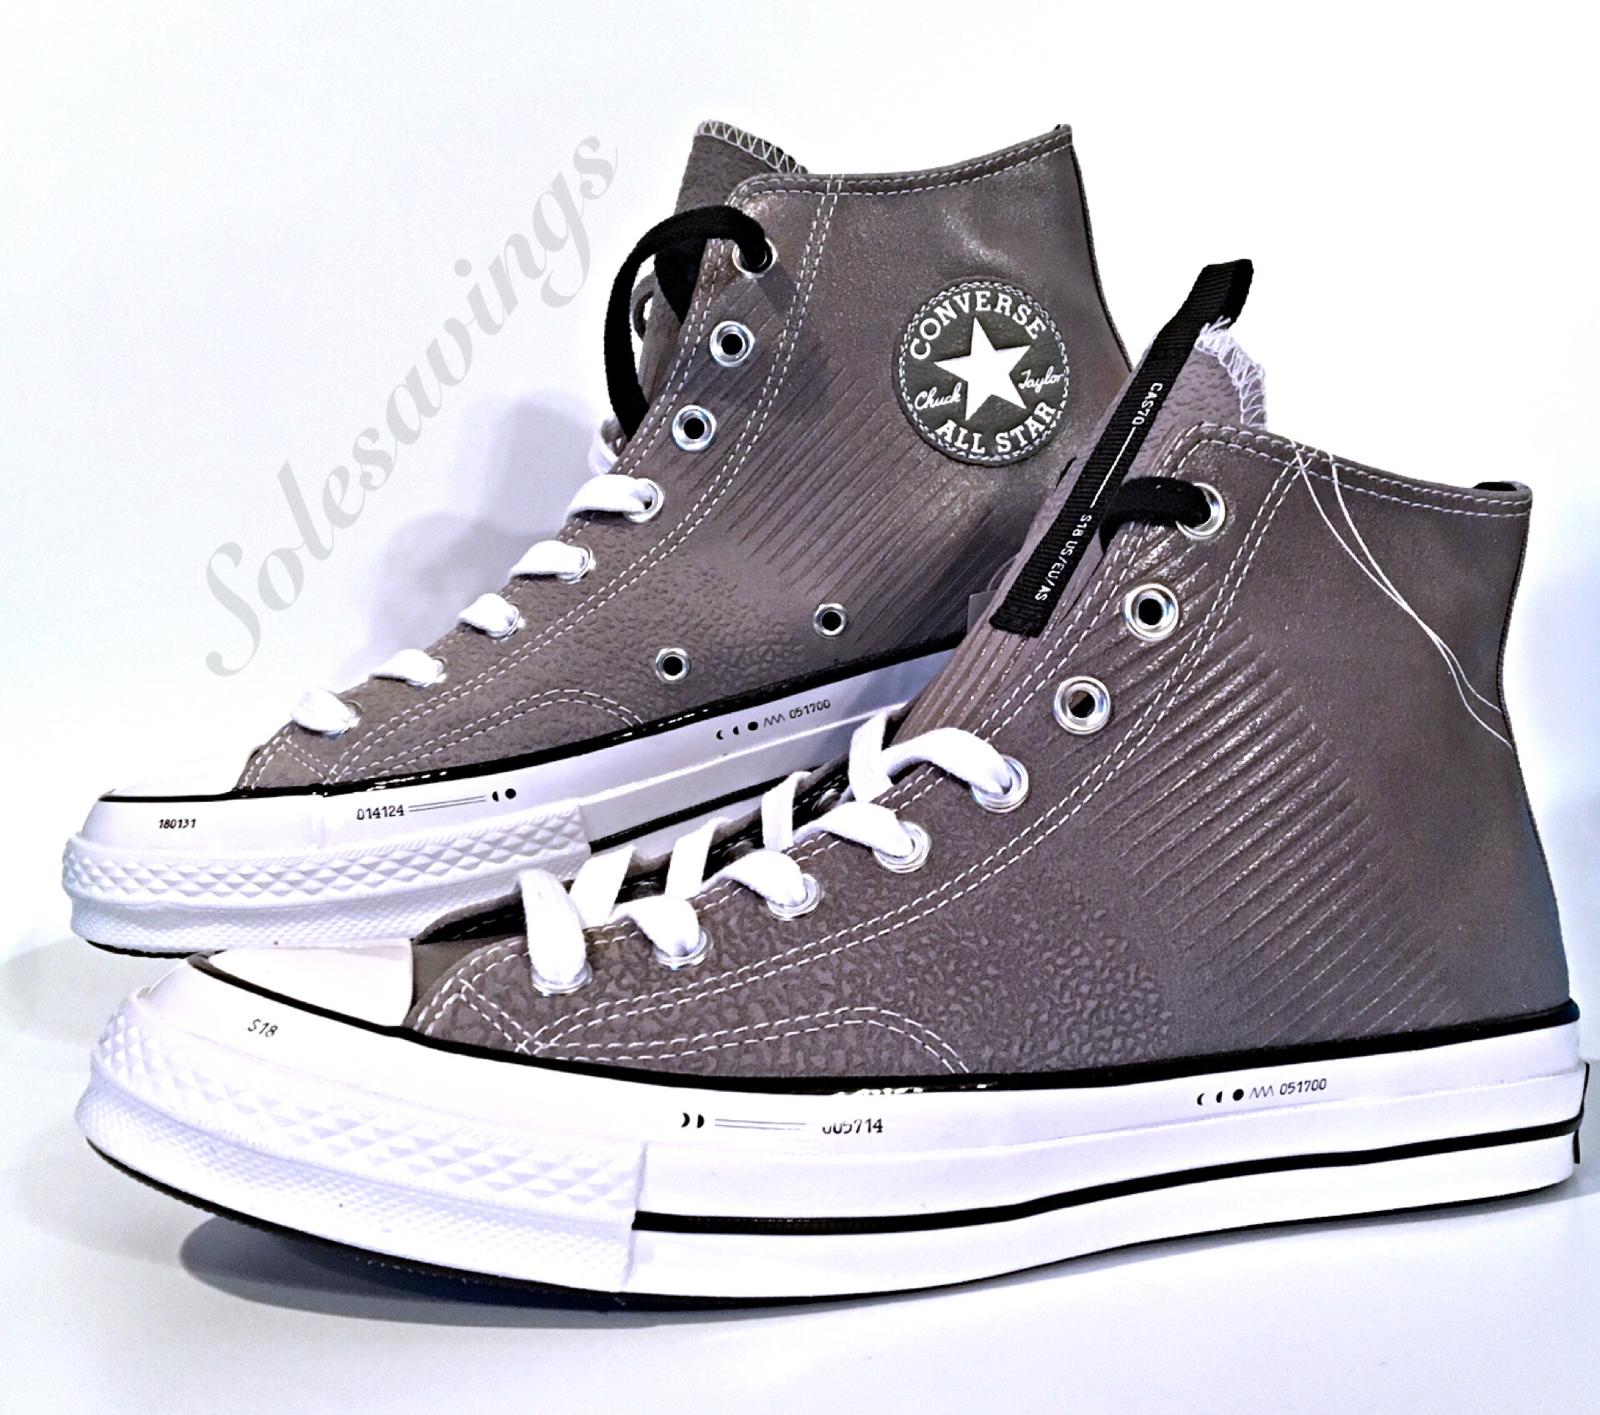 Converse Chuck Taylor All Star 70 Hi Lunar Eclipse grigio Mens scarpe Sz 160338C